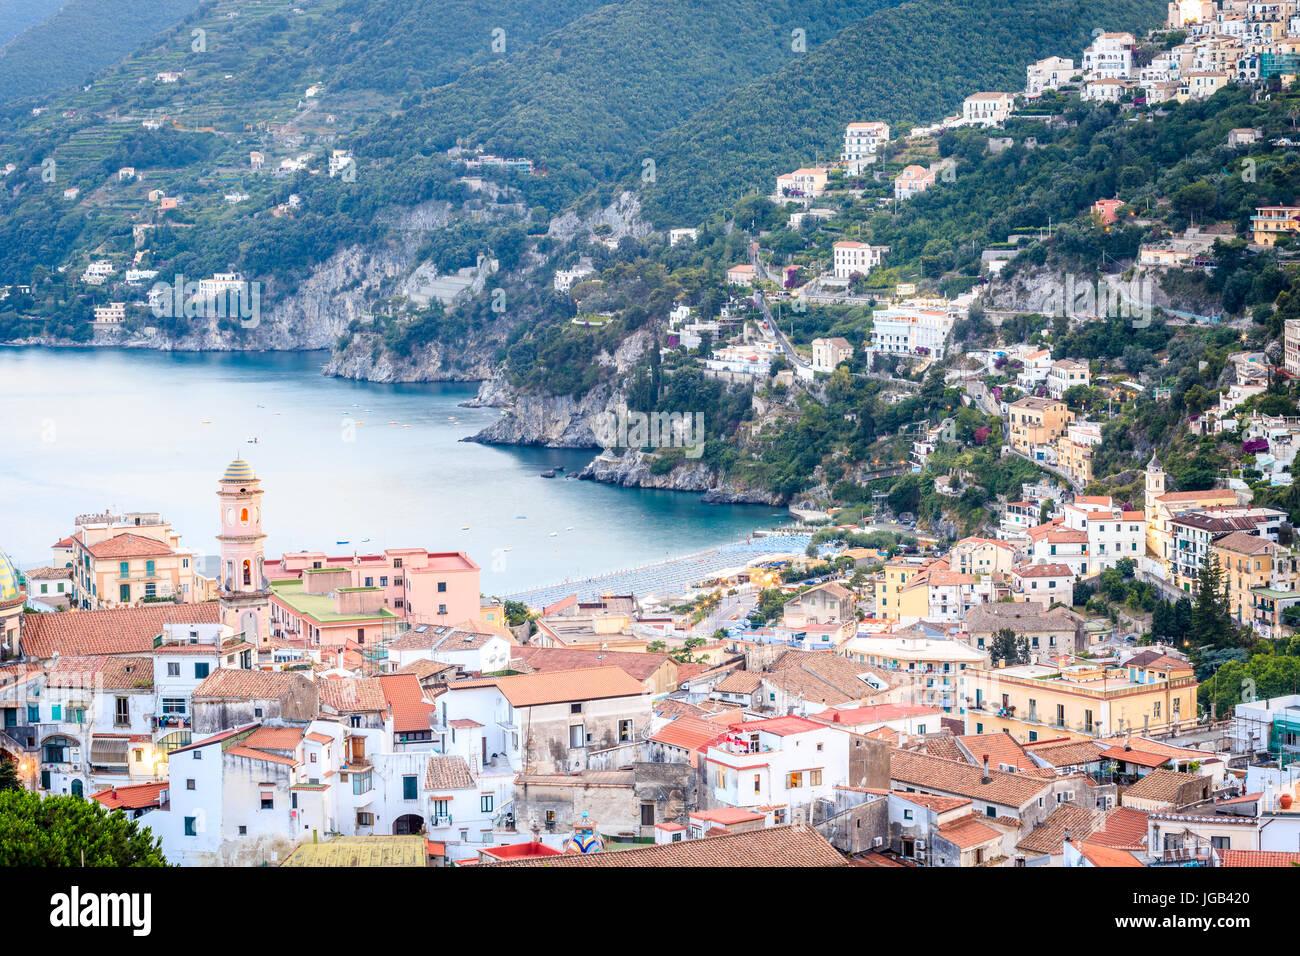 Vietri Sul Mare, Amalfi Coast, Salerno, Campania, Italy Stock Photo